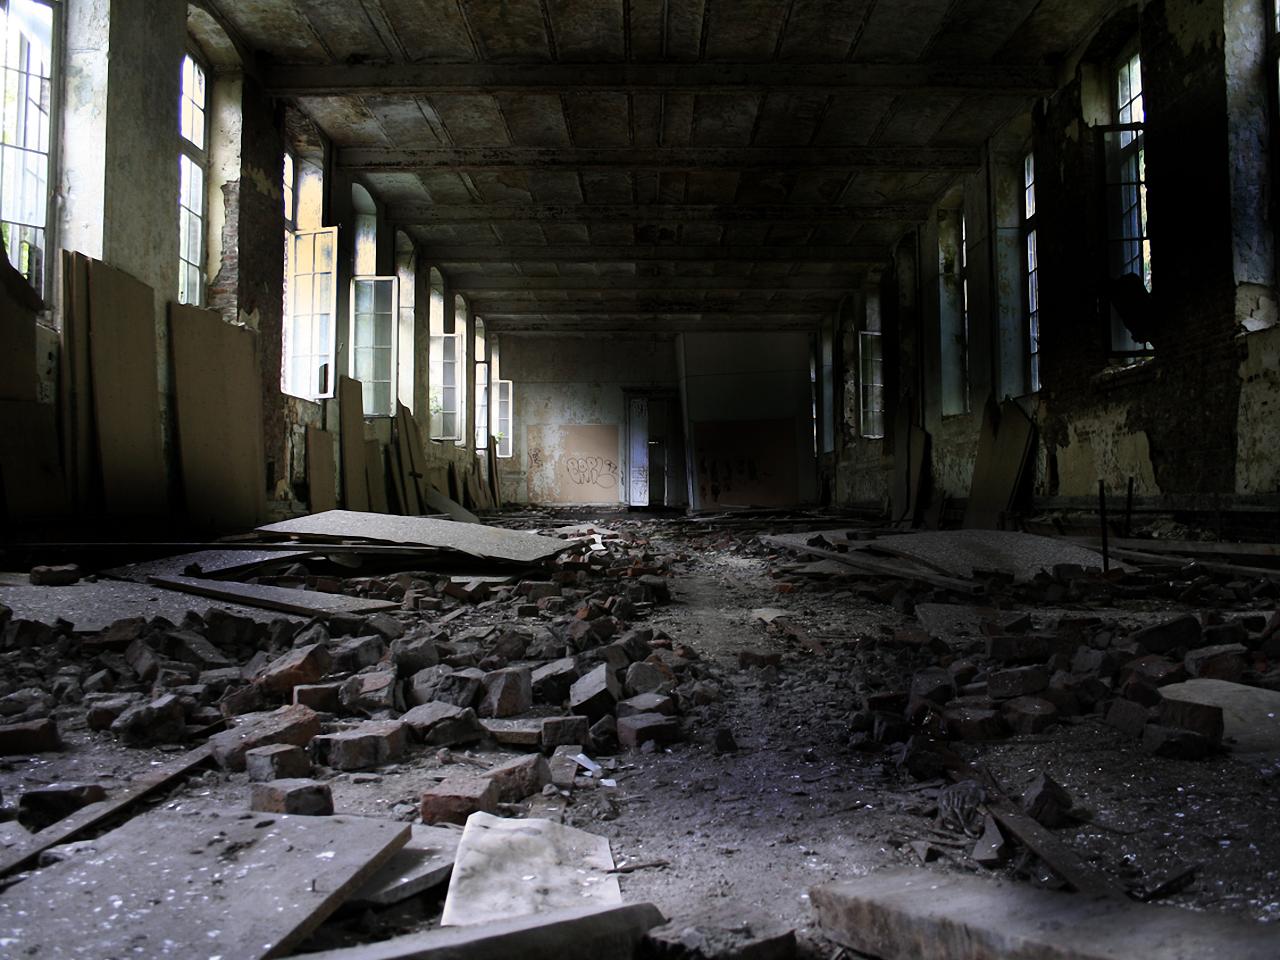 50+] Abandoned Places Wallpaper on WallpaperSafari